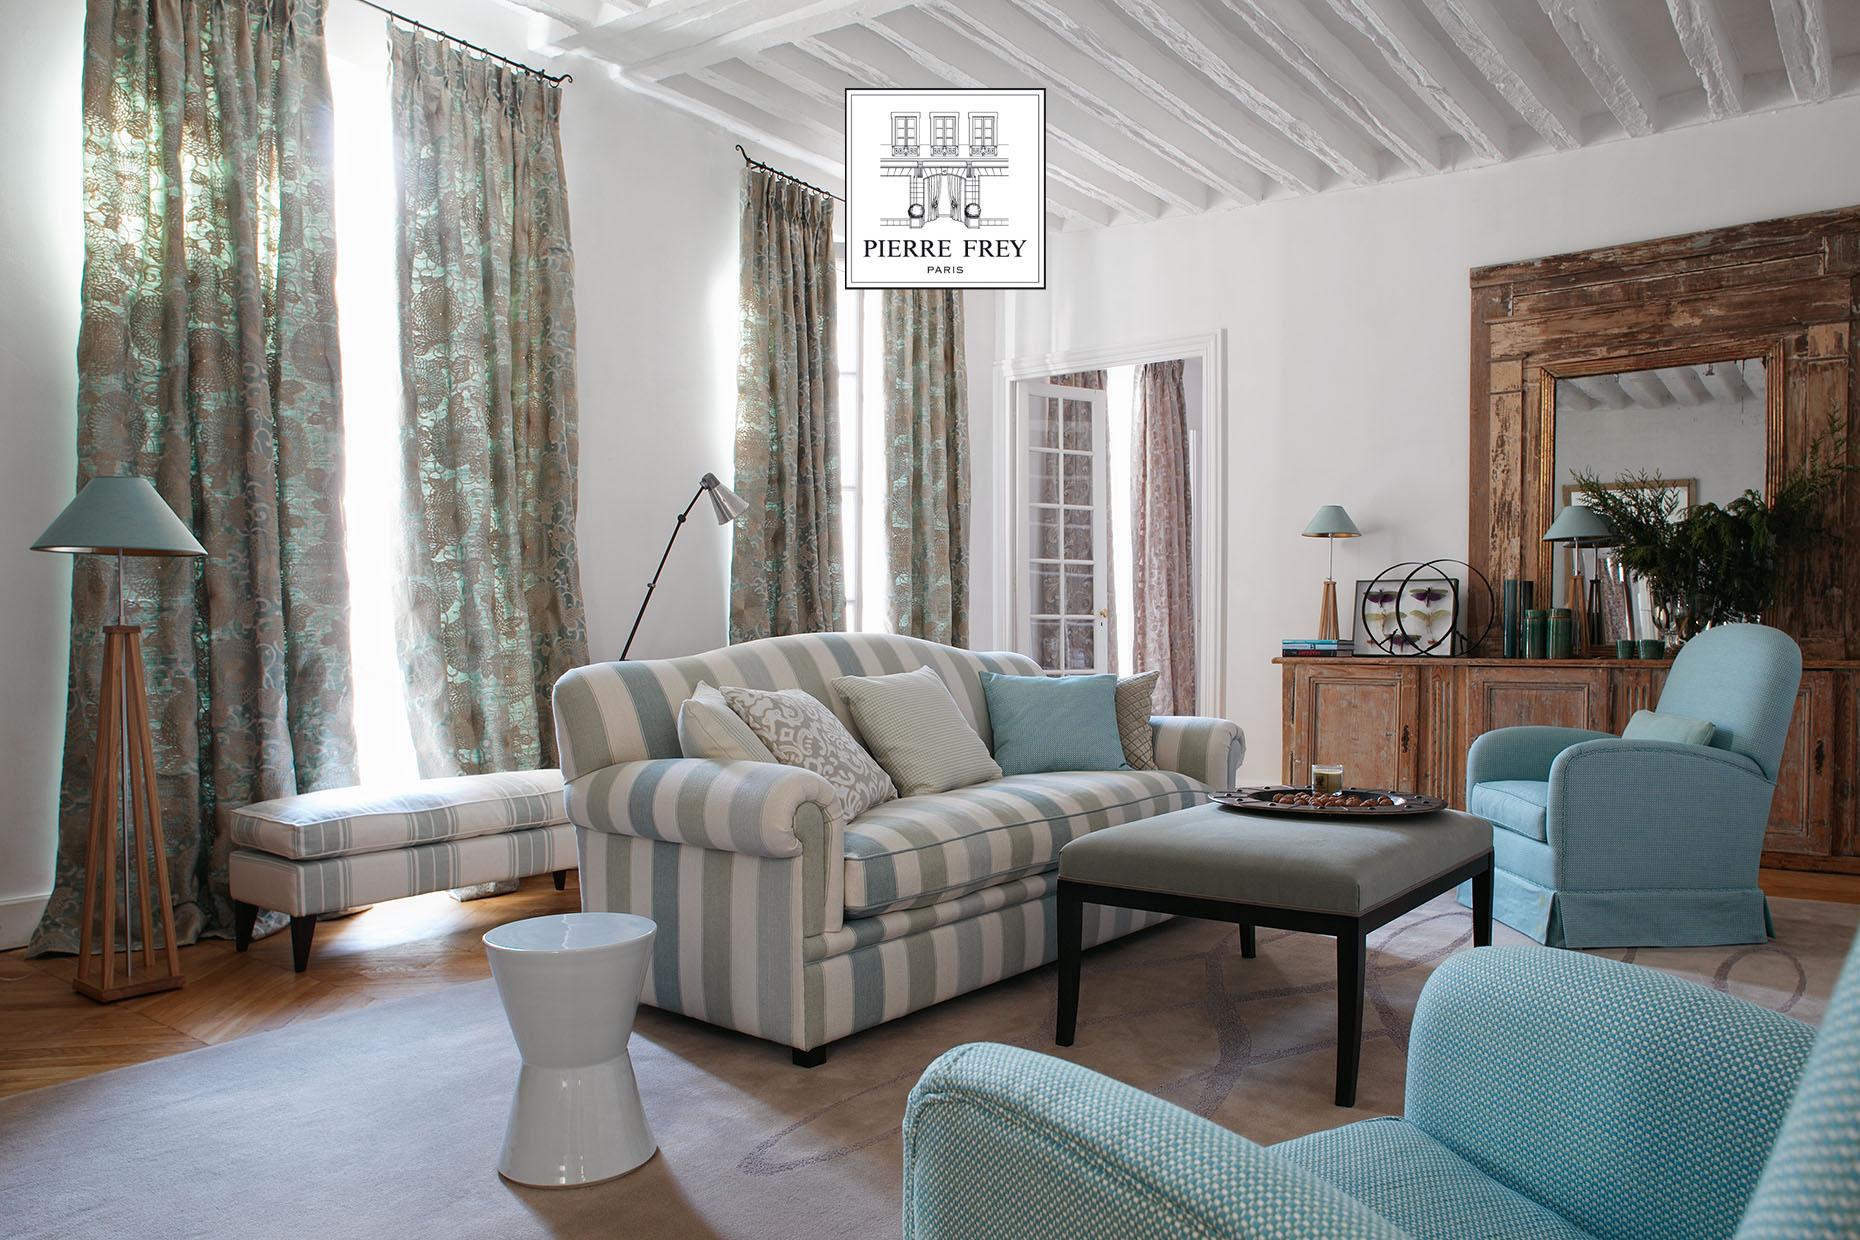 pierre frey c interieur. Black Bedroom Furniture Sets. Home Design Ideas